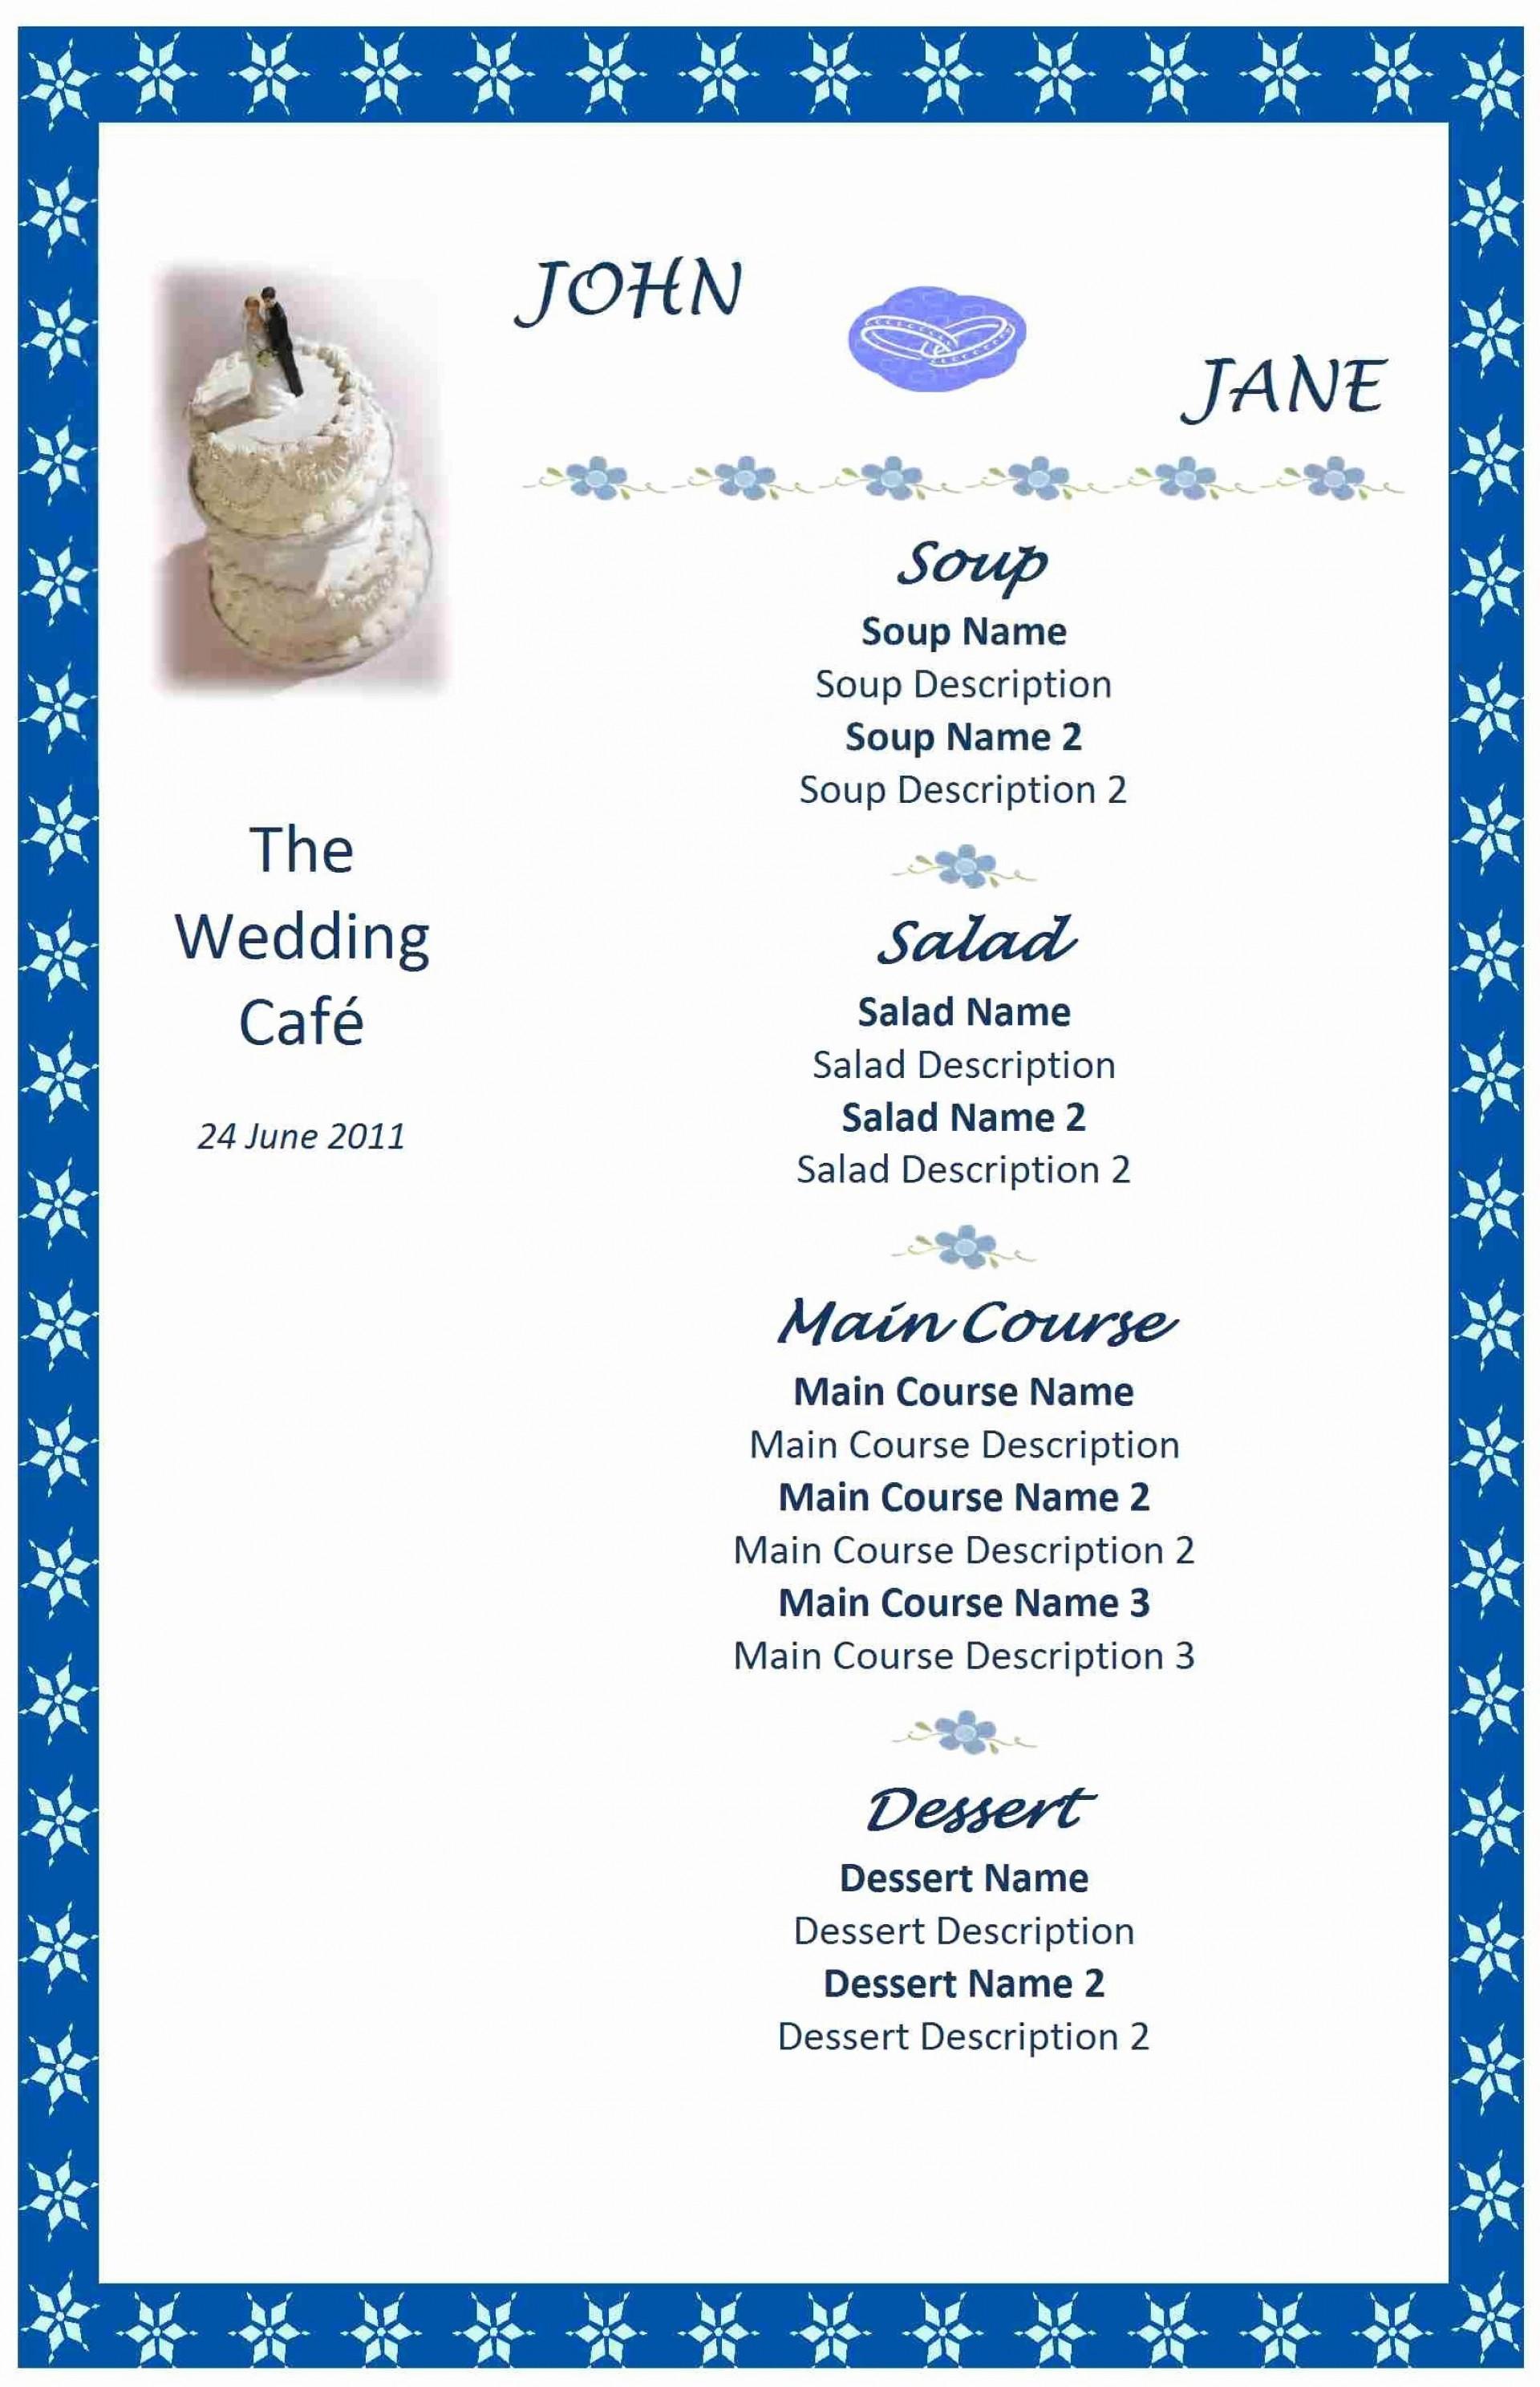 007 Fearsome M Word Invitation Template Photo  Microsoft Card Wedding Free Download Editable1920